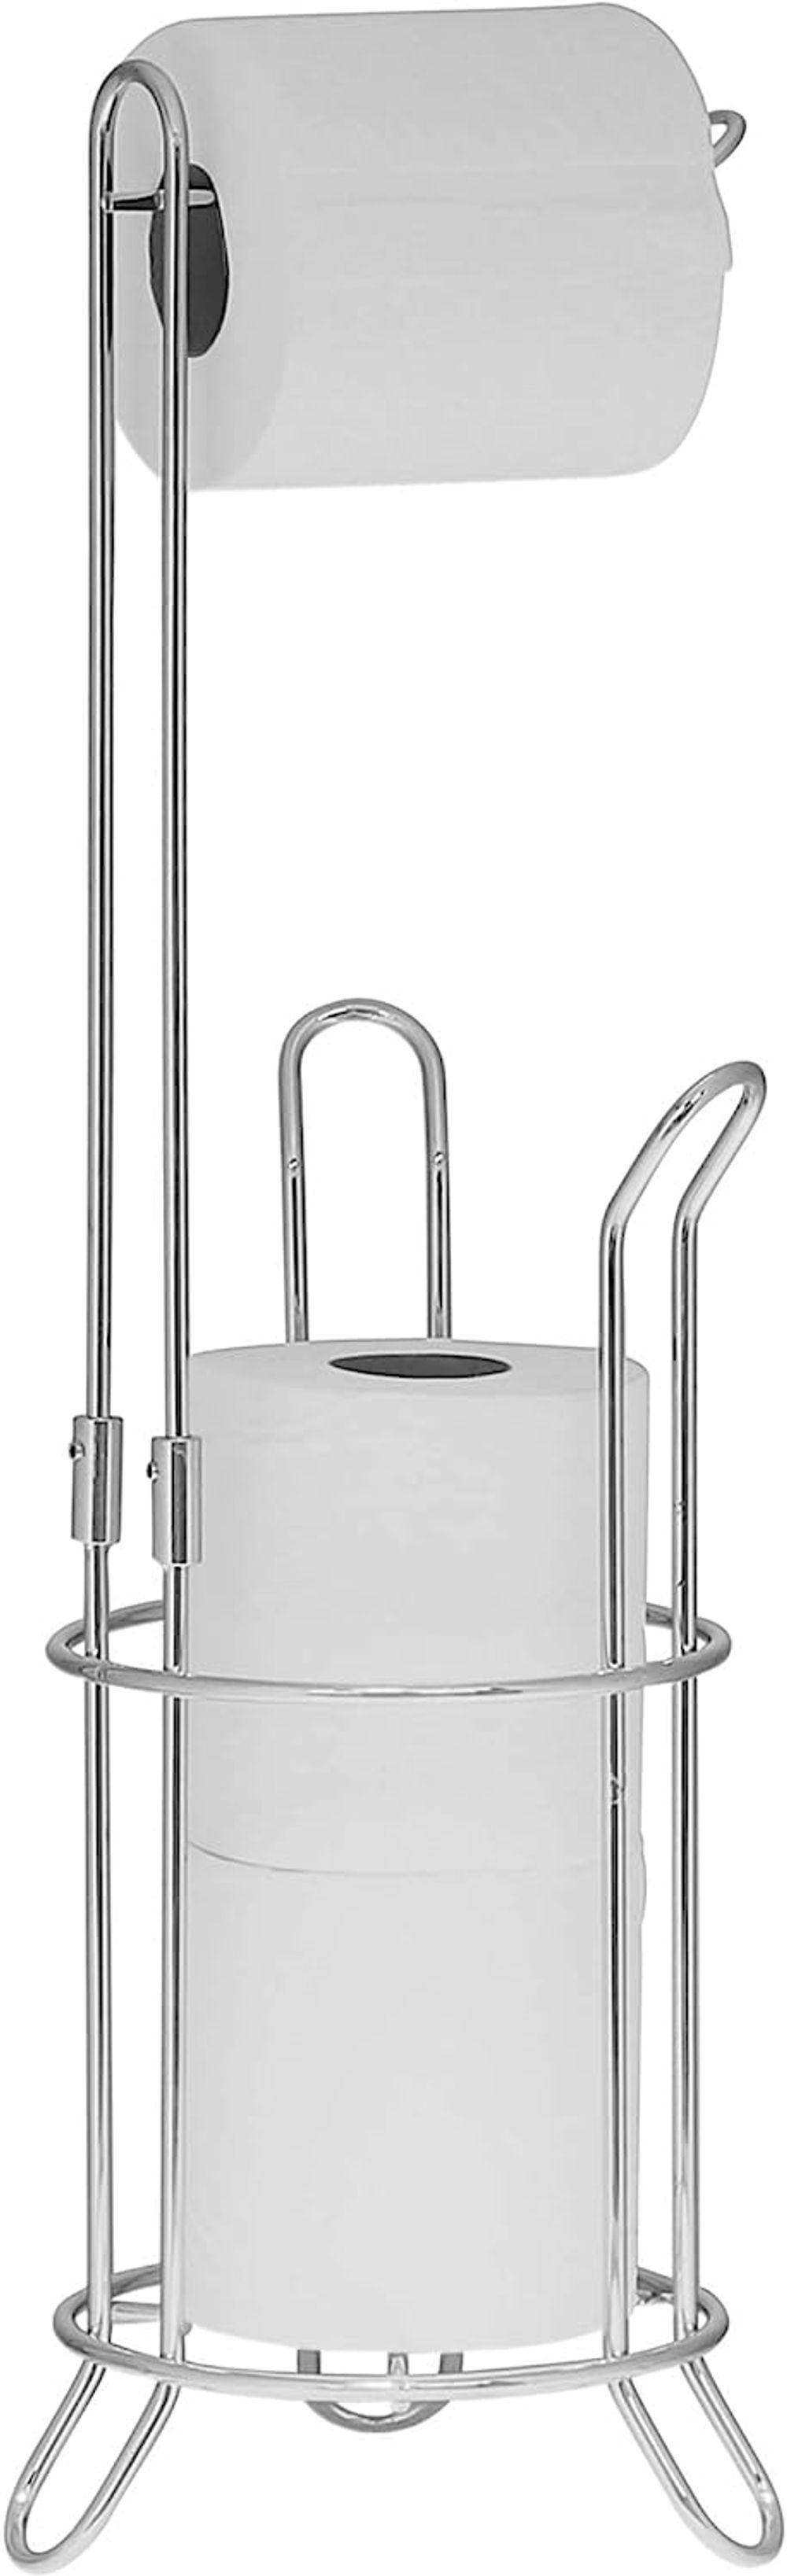 Simple Houseware Bathroom Toilet Tissue Paper Roll Storage Holder Stand, Chrome Finish